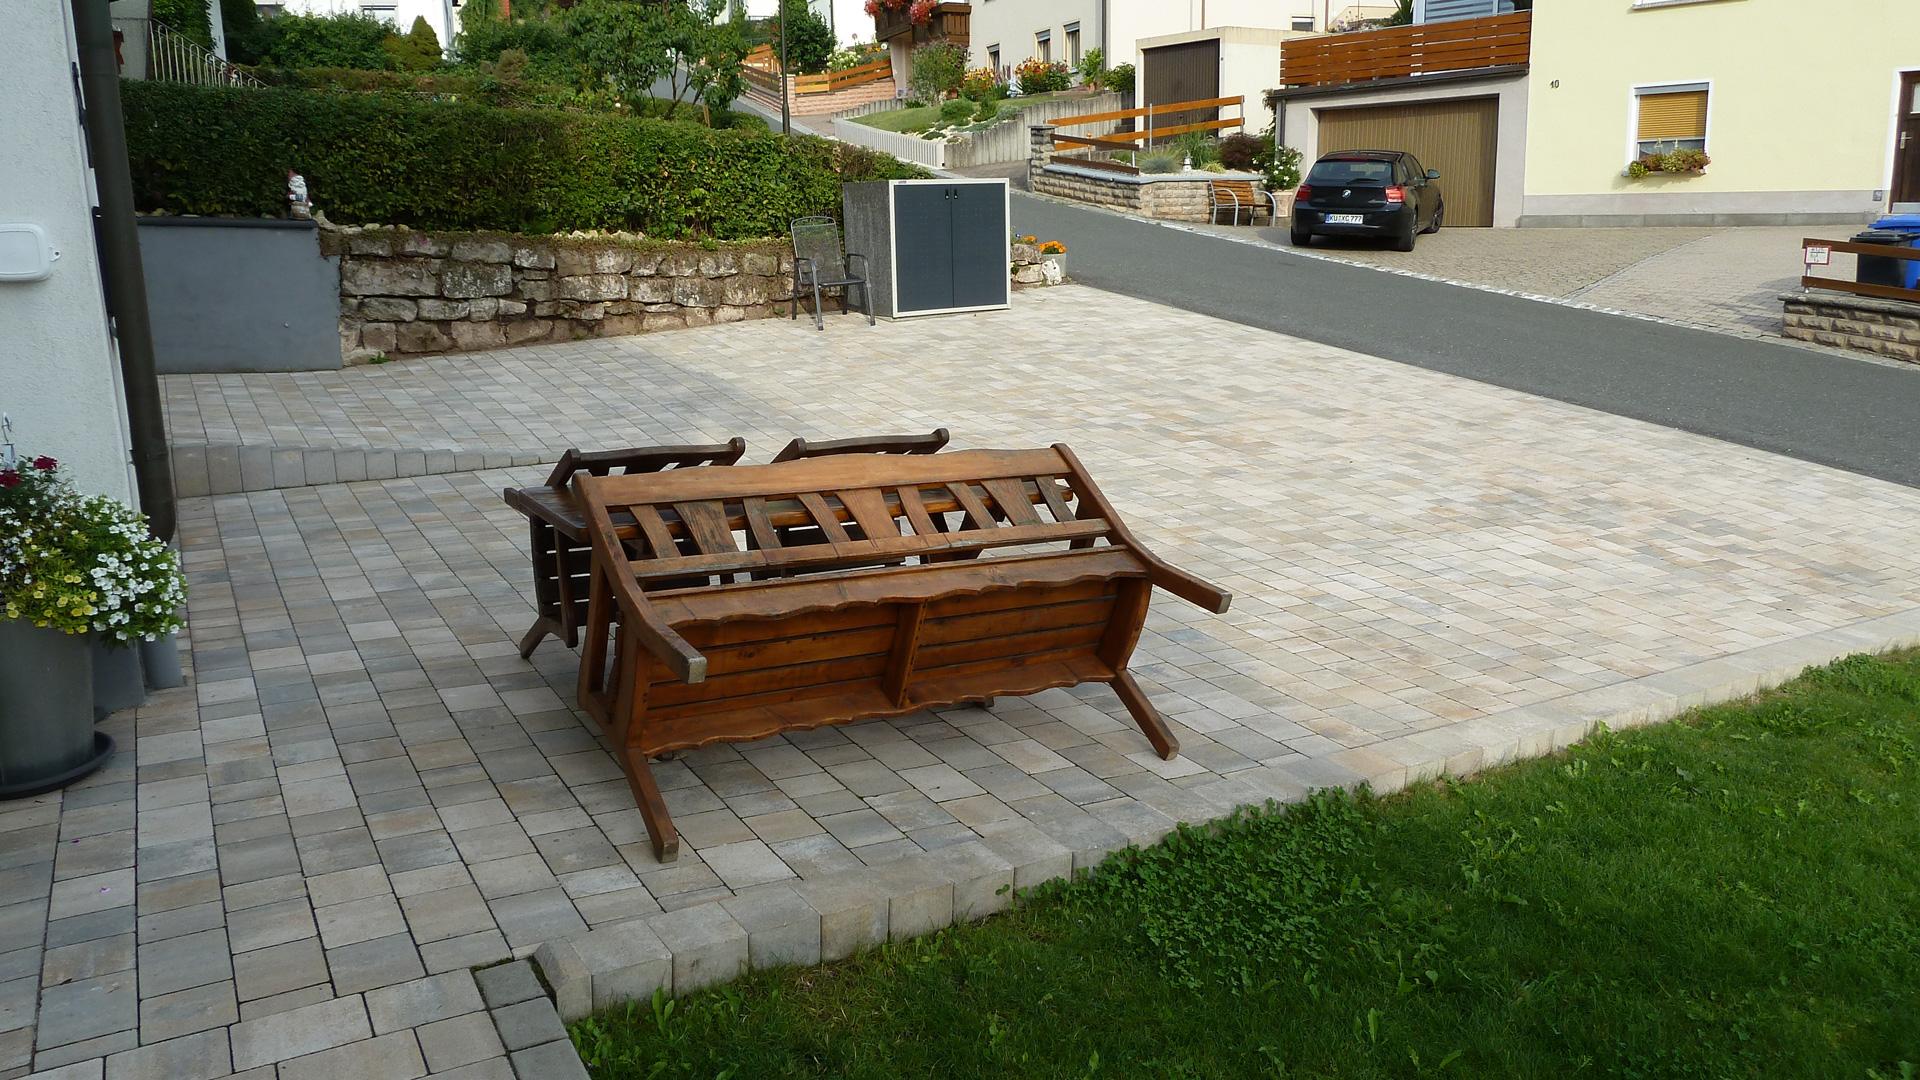 wagner treppenbau gmbh mainleus betonpflastersteine. Black Bedroom Furniture Sets. Home Design Ideas